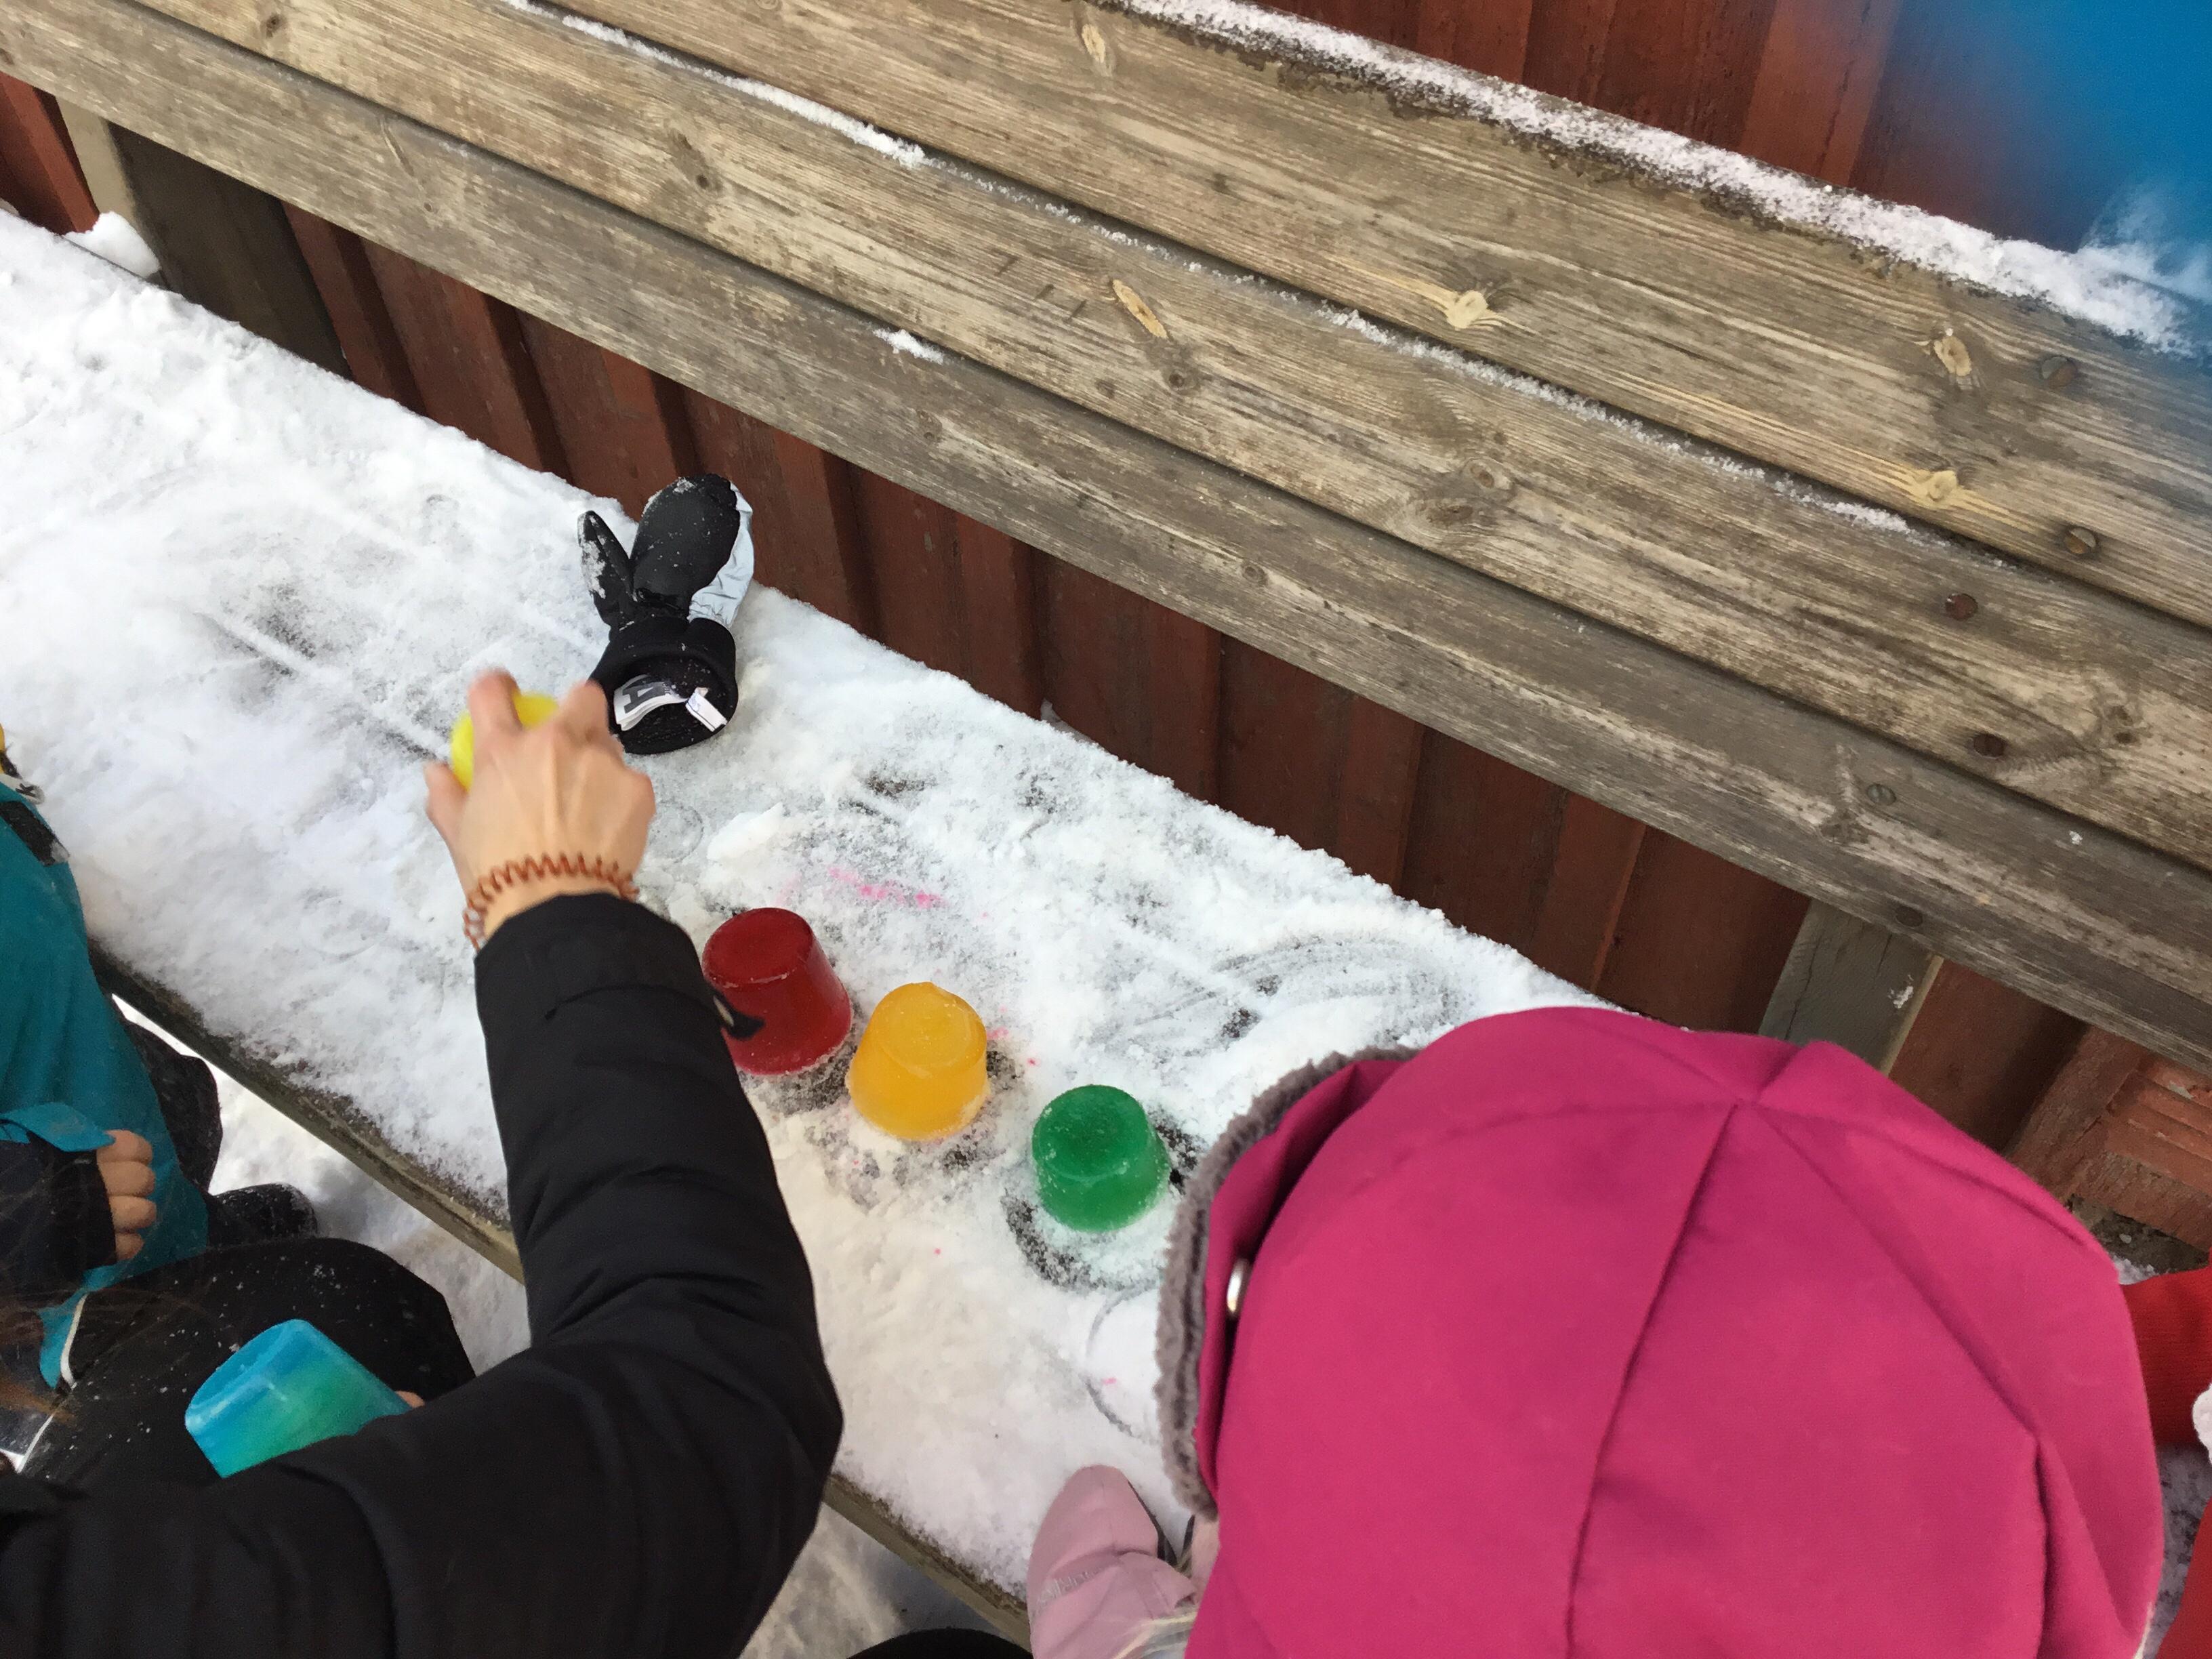 Vi knackar ut isen ur formarna